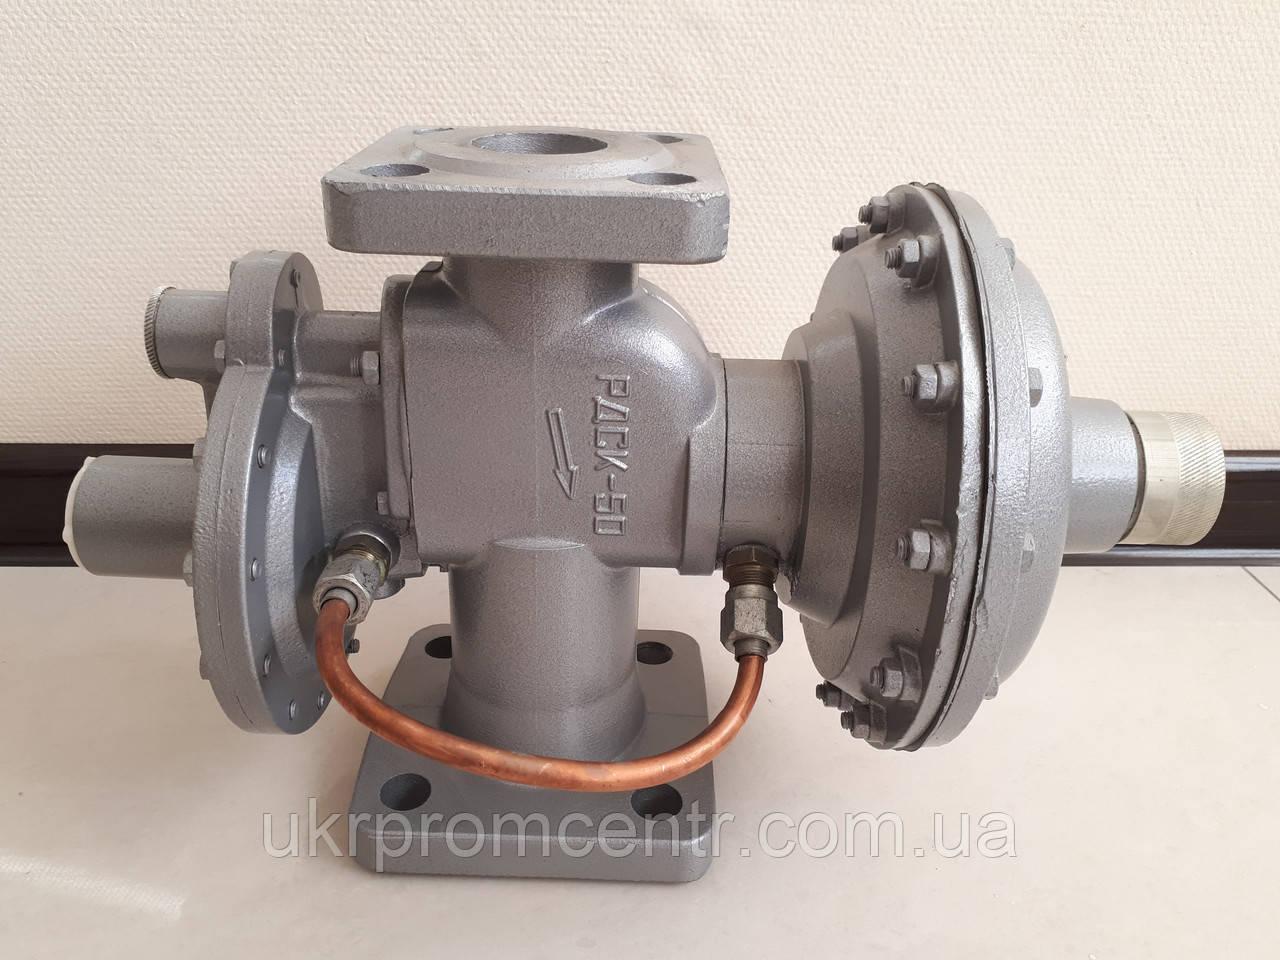 Регулятор давления газа   РДСК-50М-1; РДСК-50М-3; РДСК-50БМ